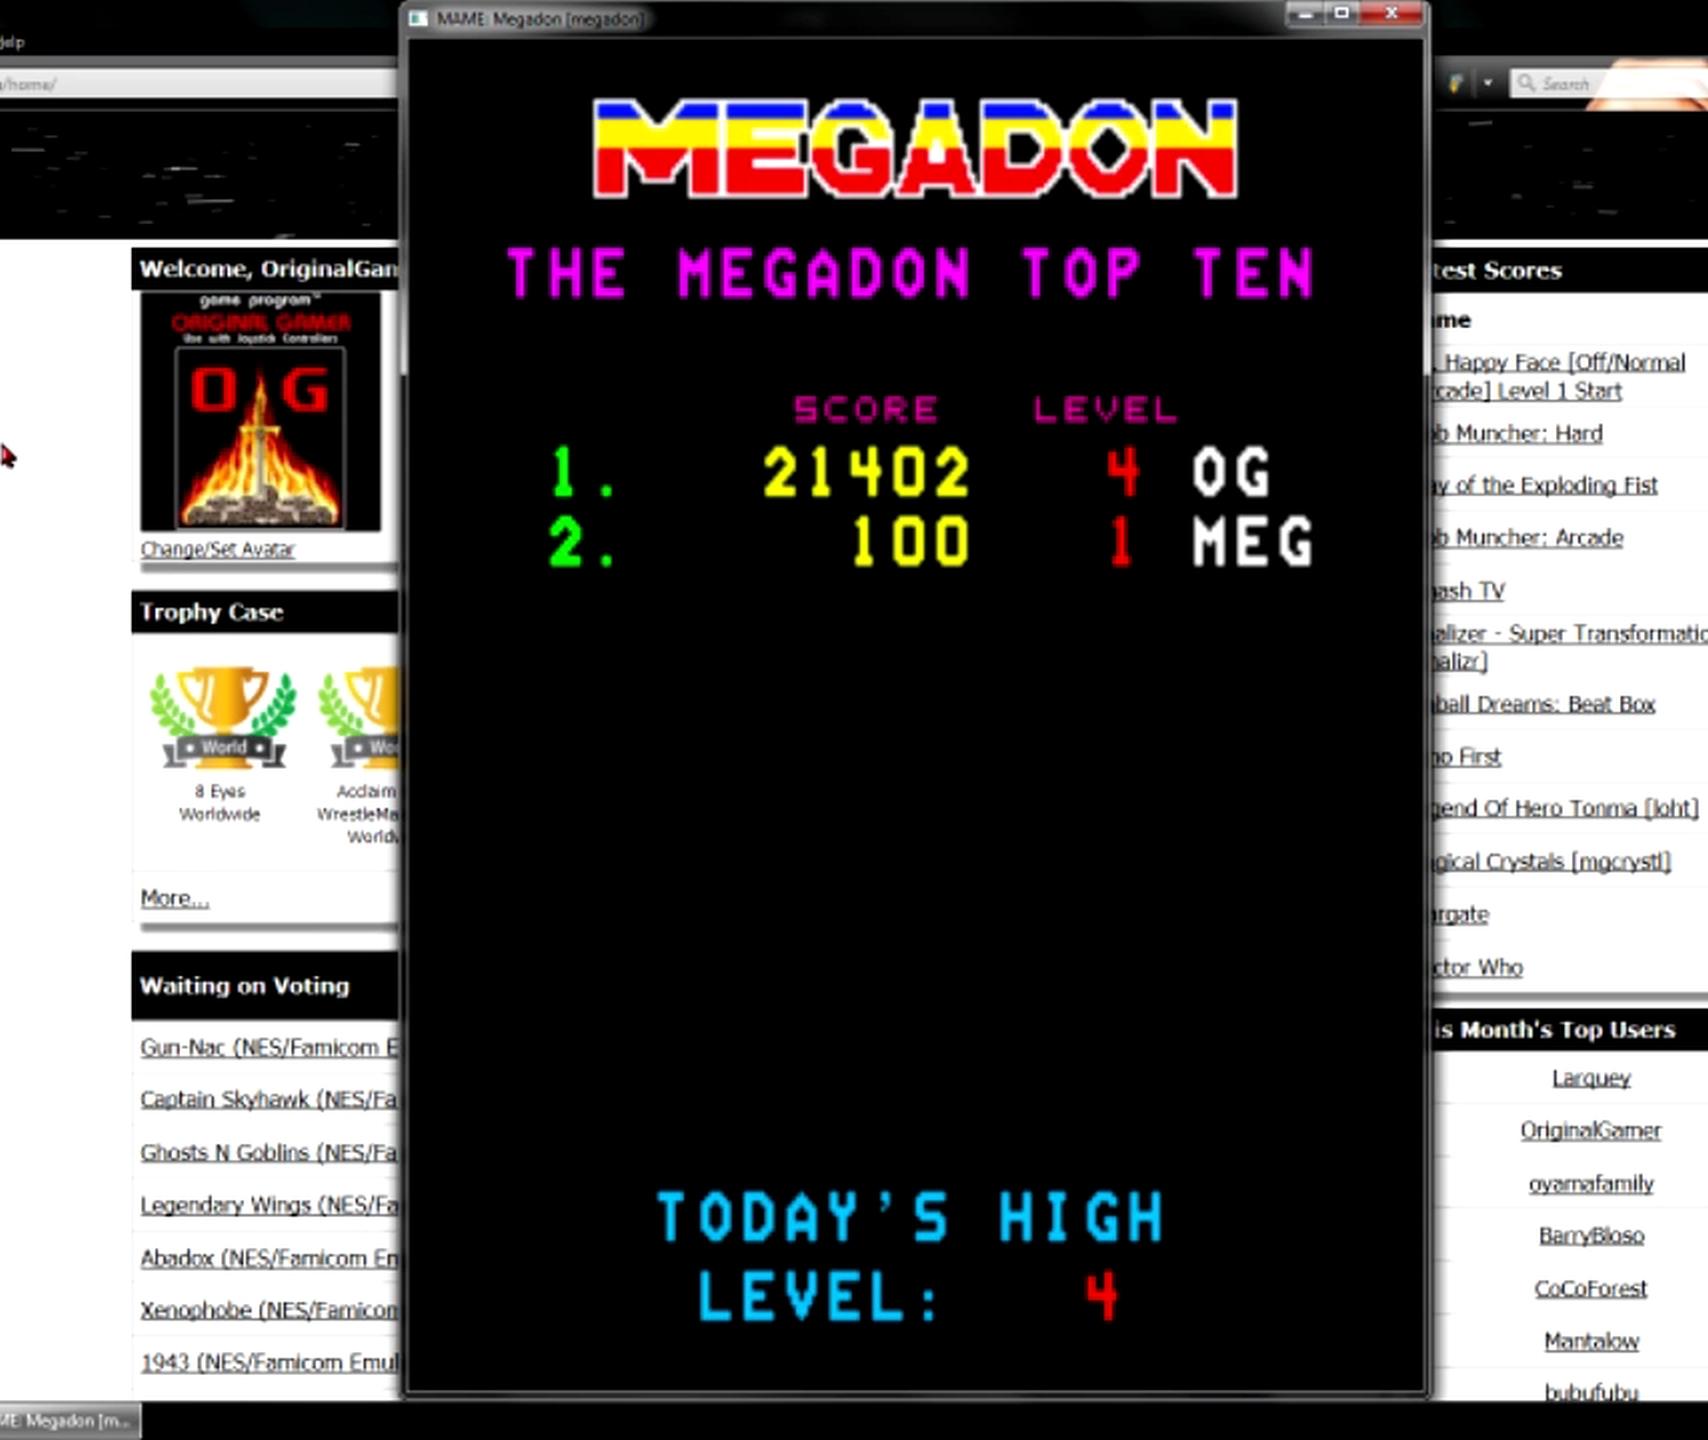 OriginalGamer: Megadon [megadon] (Arcade Emulated / M.A.M.E.) 21,402 points on 2015-05-30 23:46:47